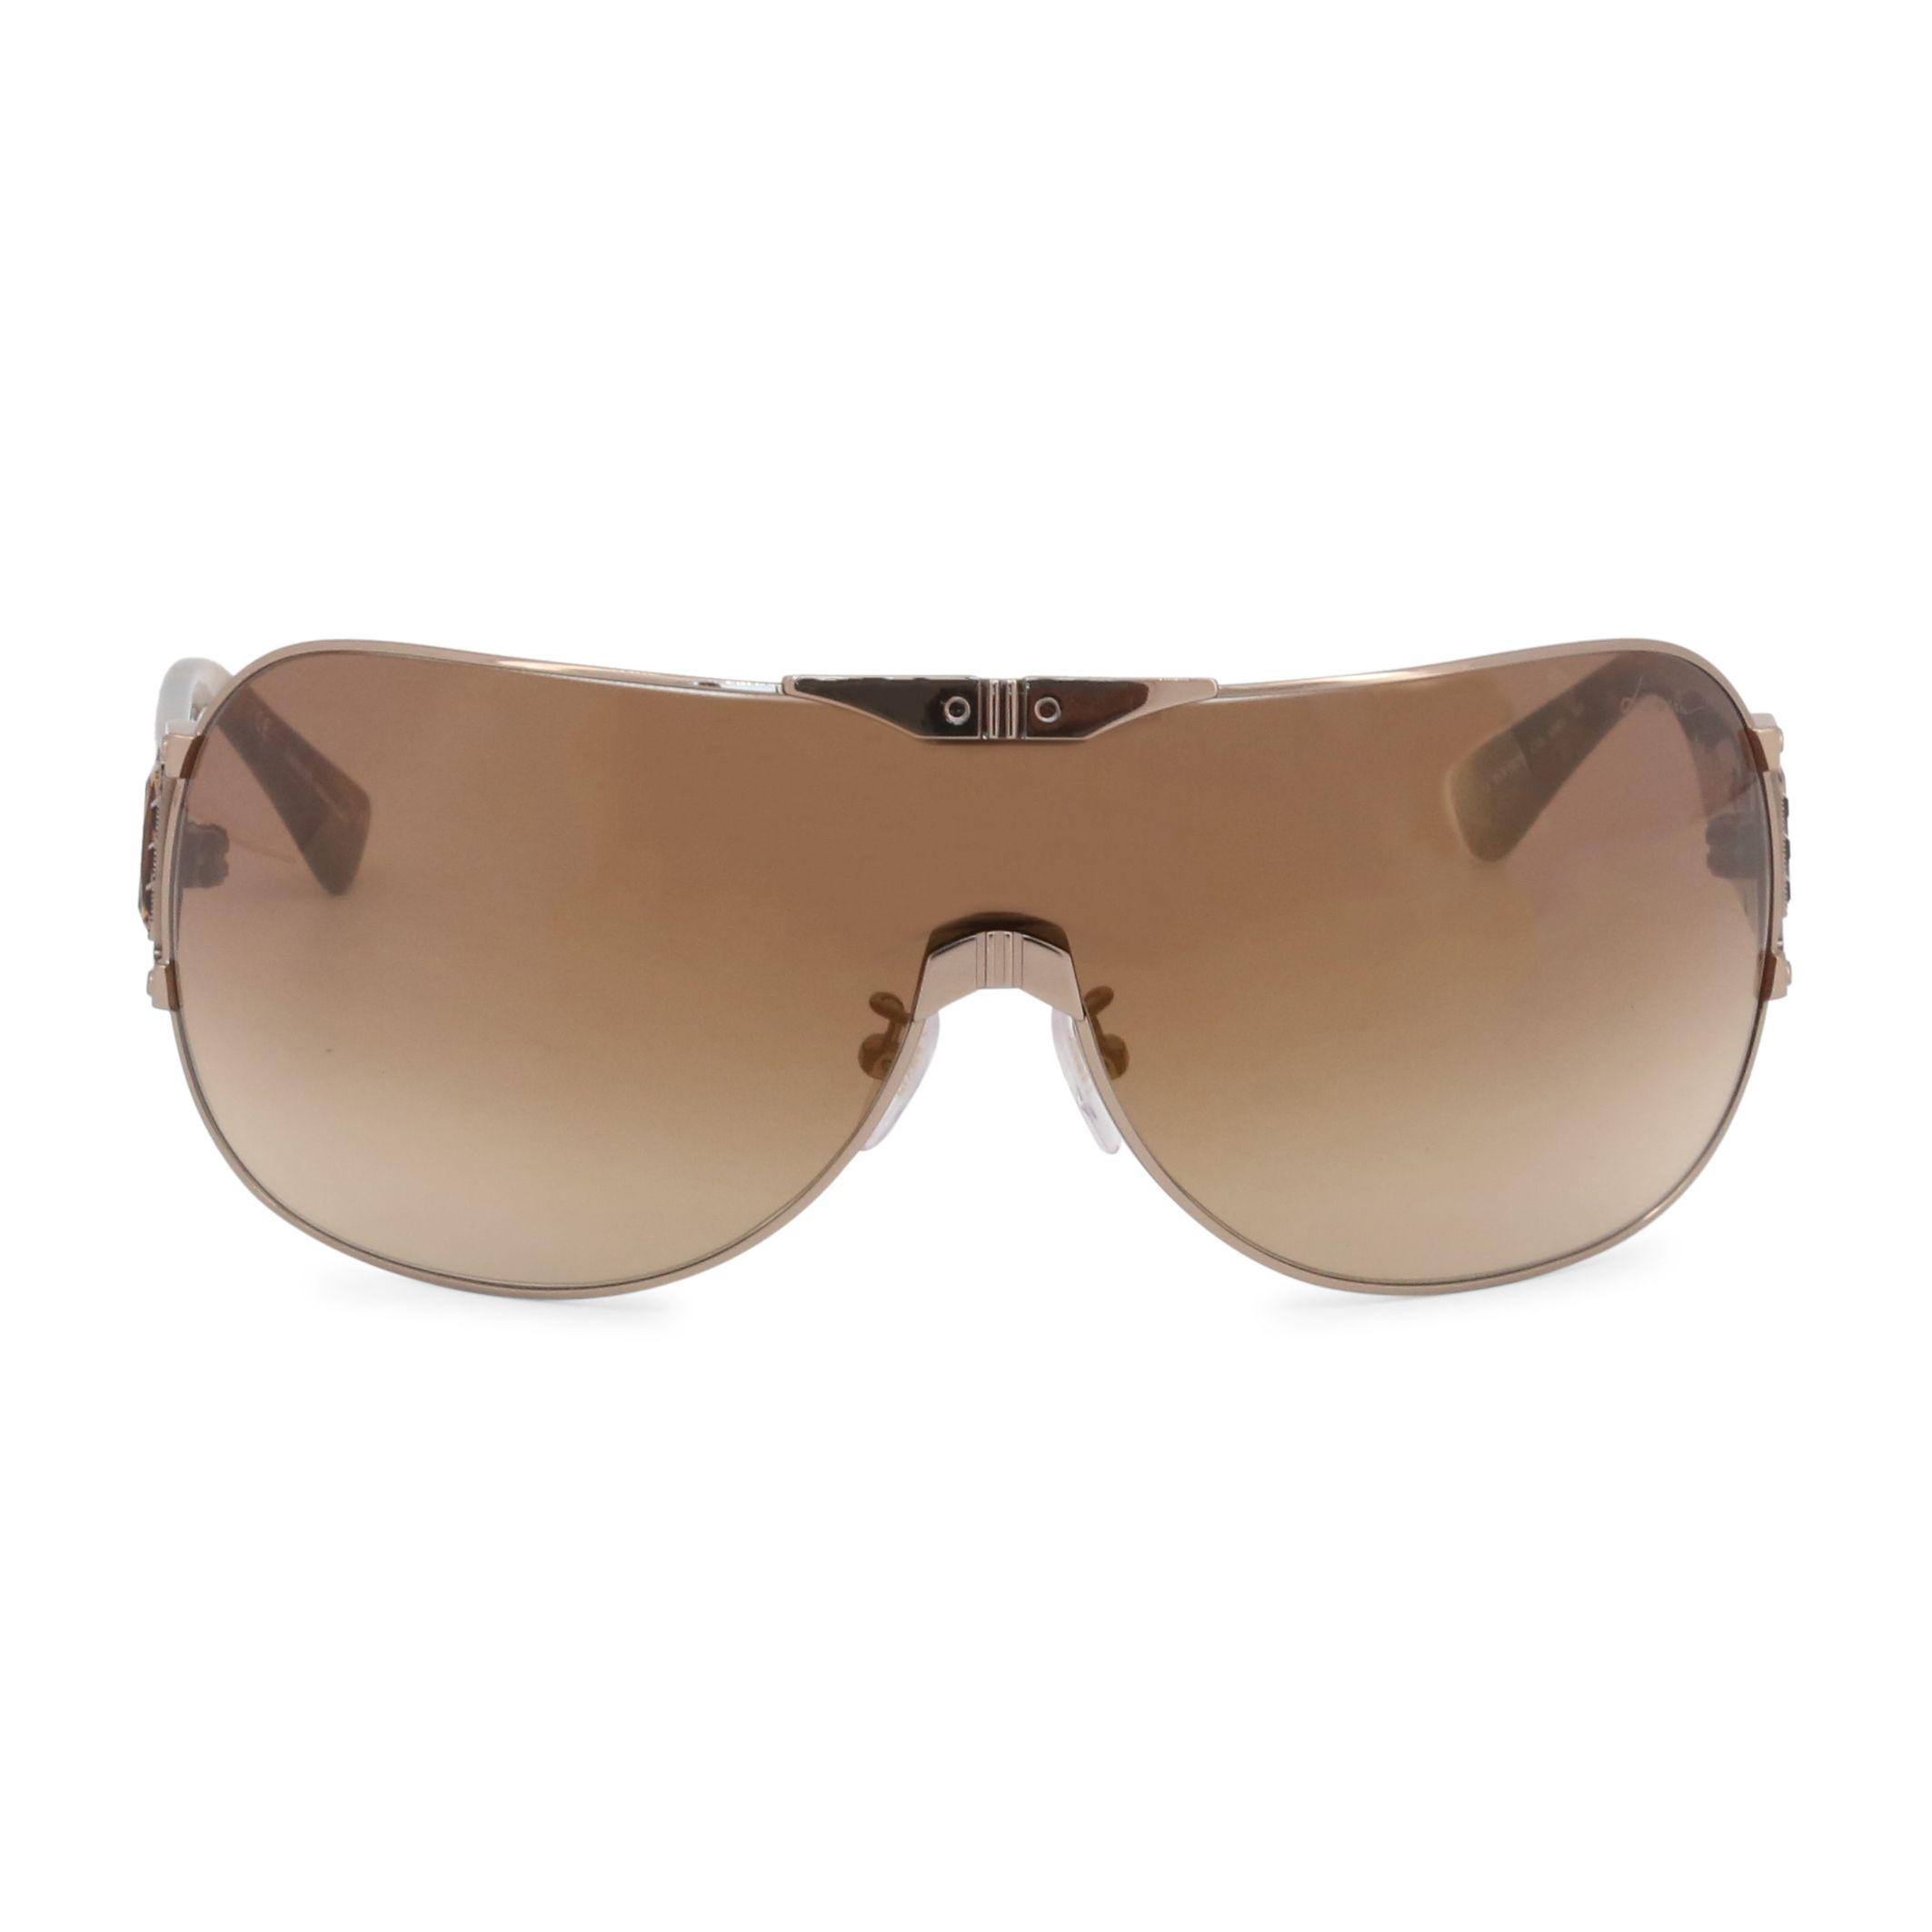 Lanvin Womens Sunglasses